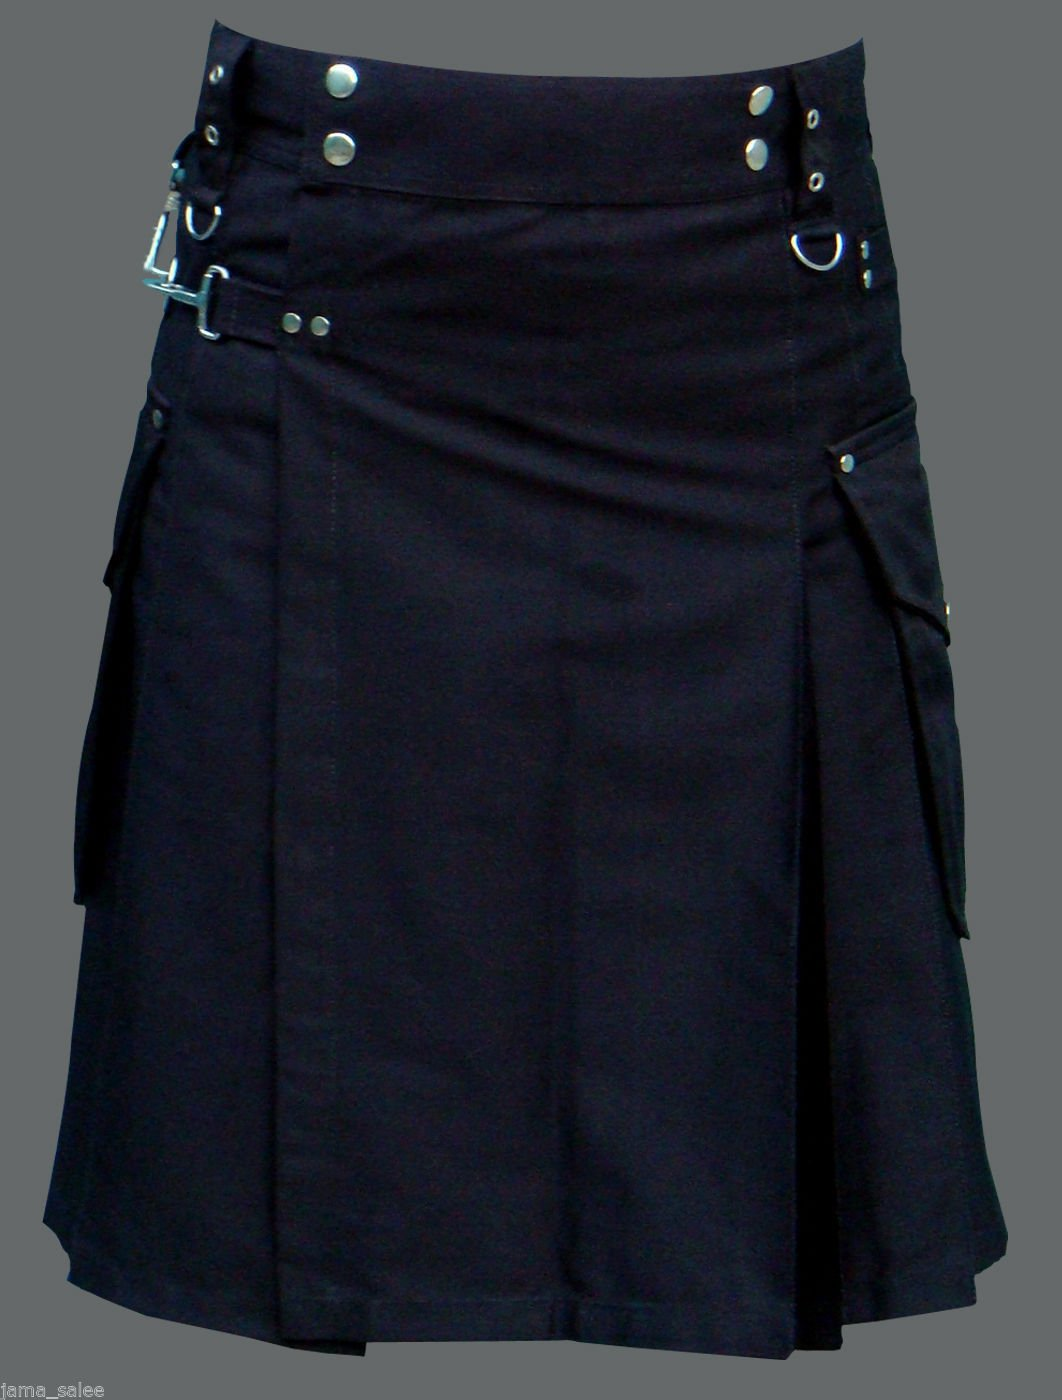 Men 44 Waist Handmade Black Deluxe Utility Kilt 100% Cotton With Cargo Pockets